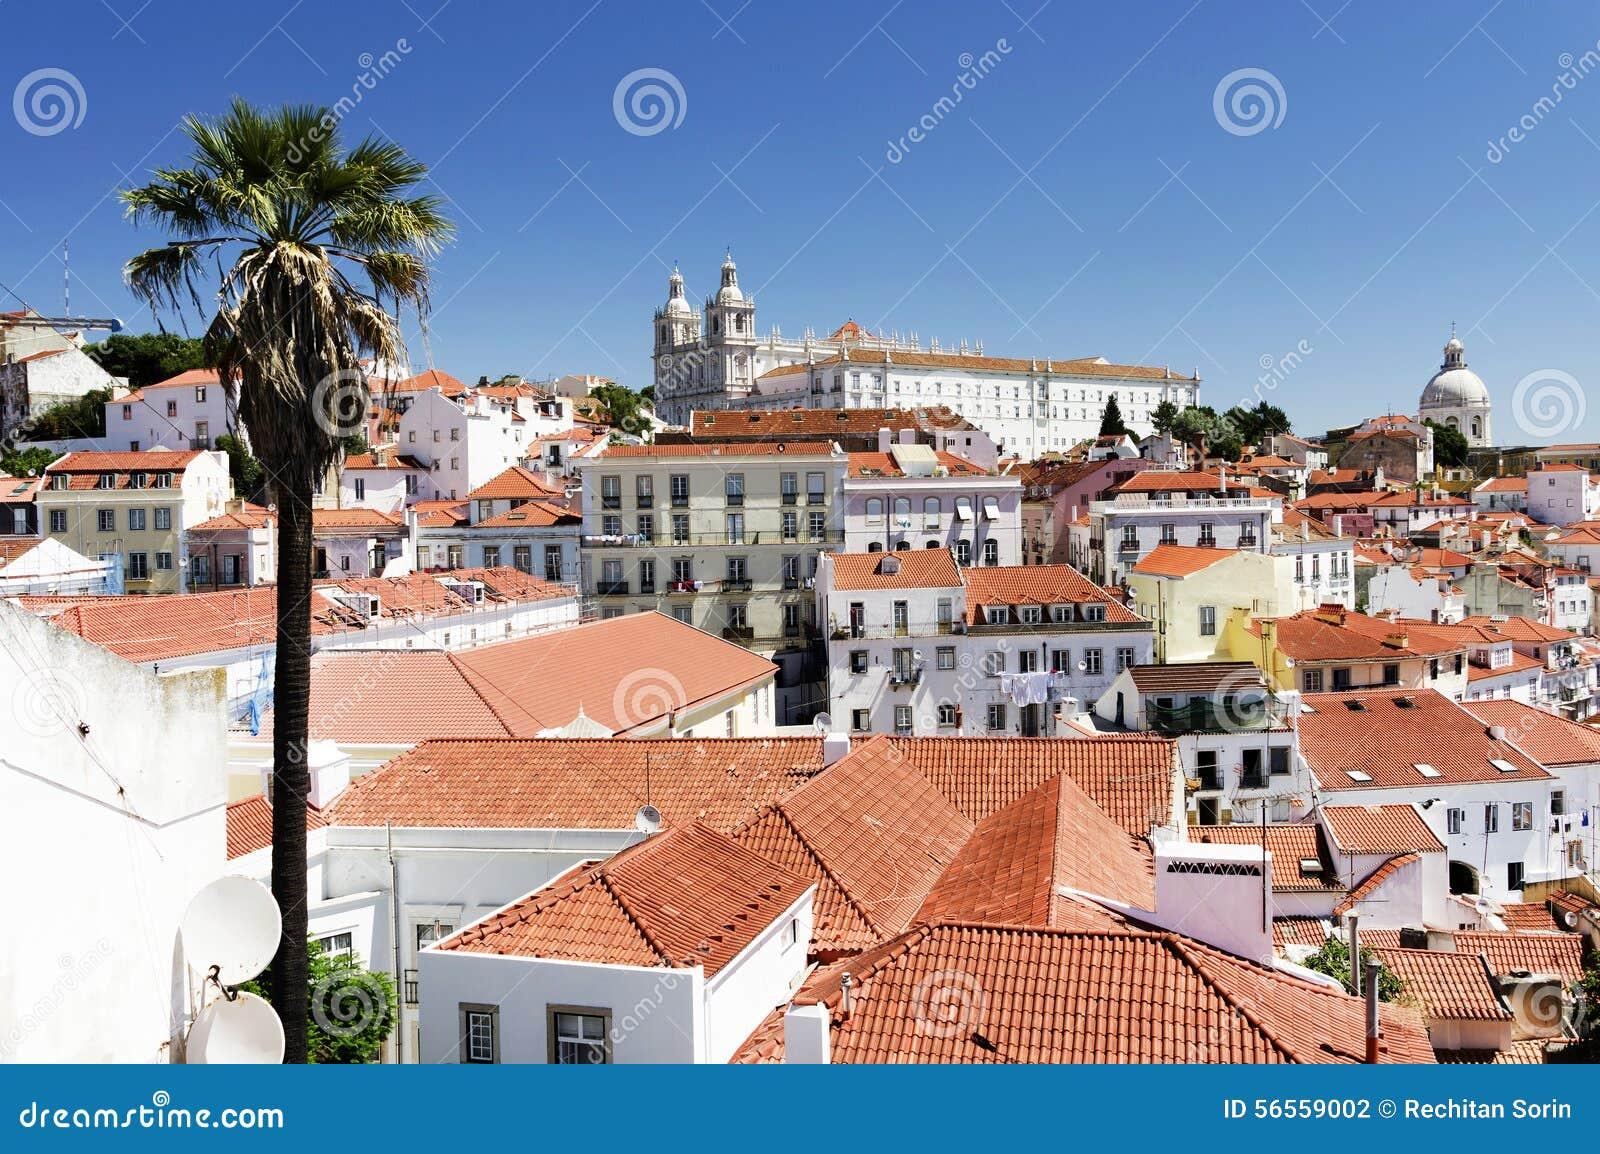 Download Αρχιτεκτονική λεπτομέρεια στη Λισσαβώνα Στοκ Εικόνες - εικόνα από γλυπτό, πλήθος: 56559002